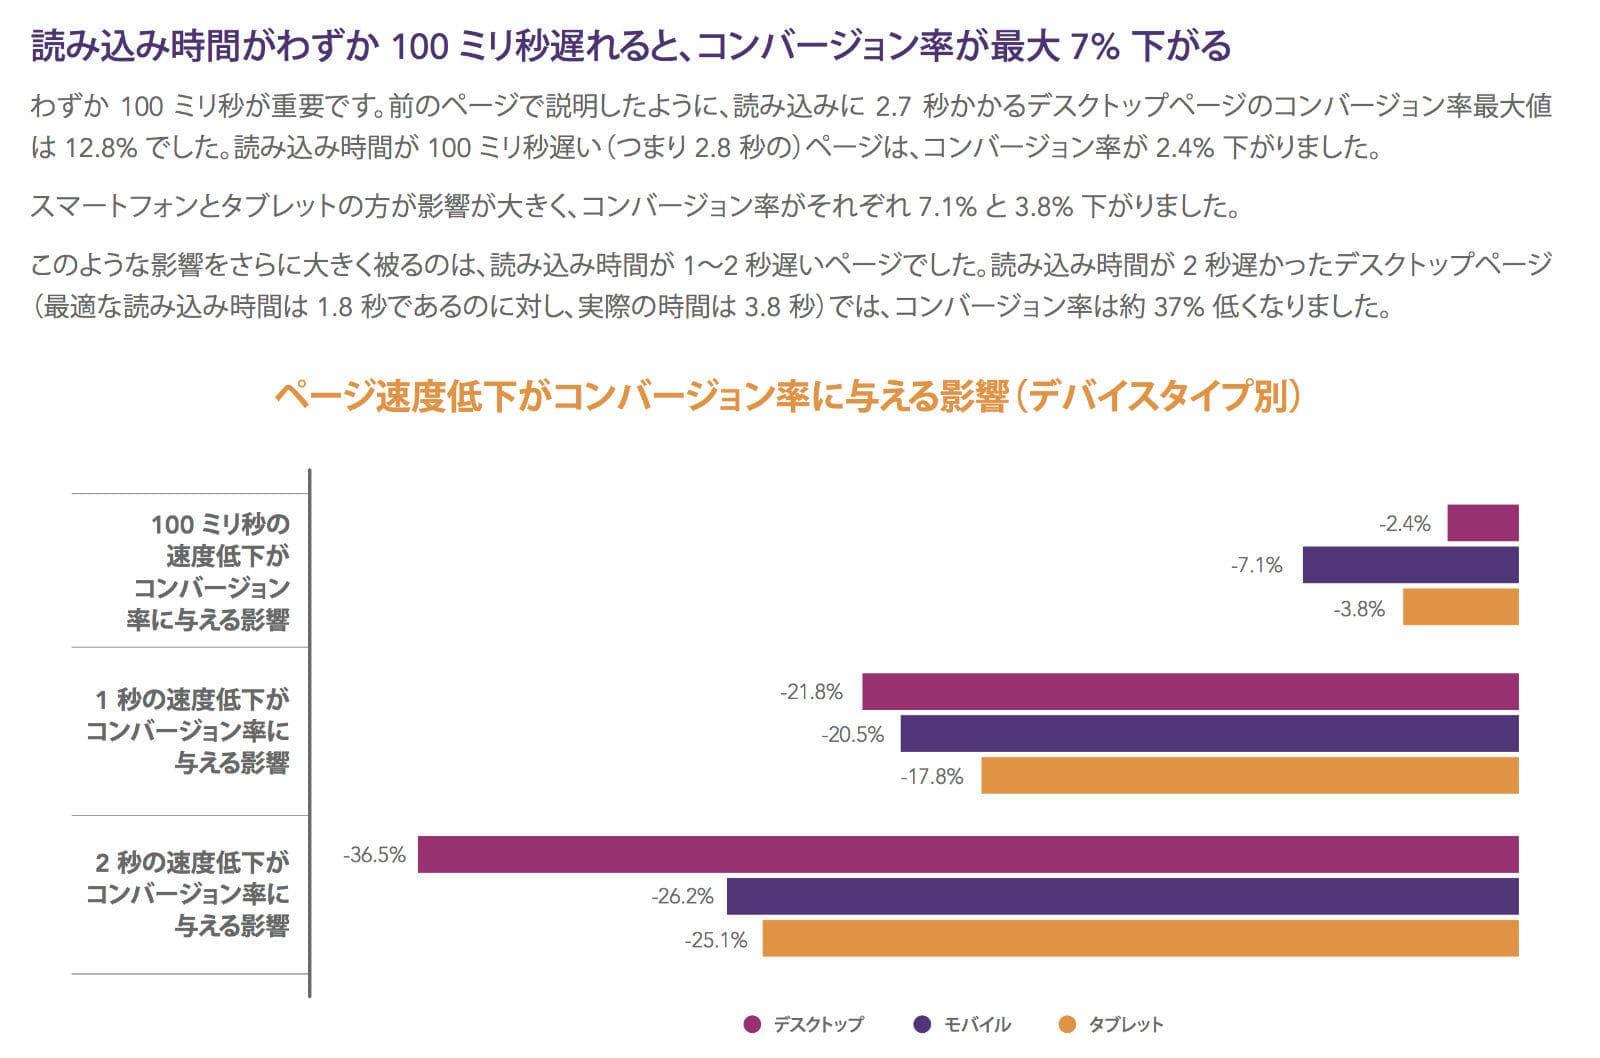 2017-12-15-akamai-report01.jpg